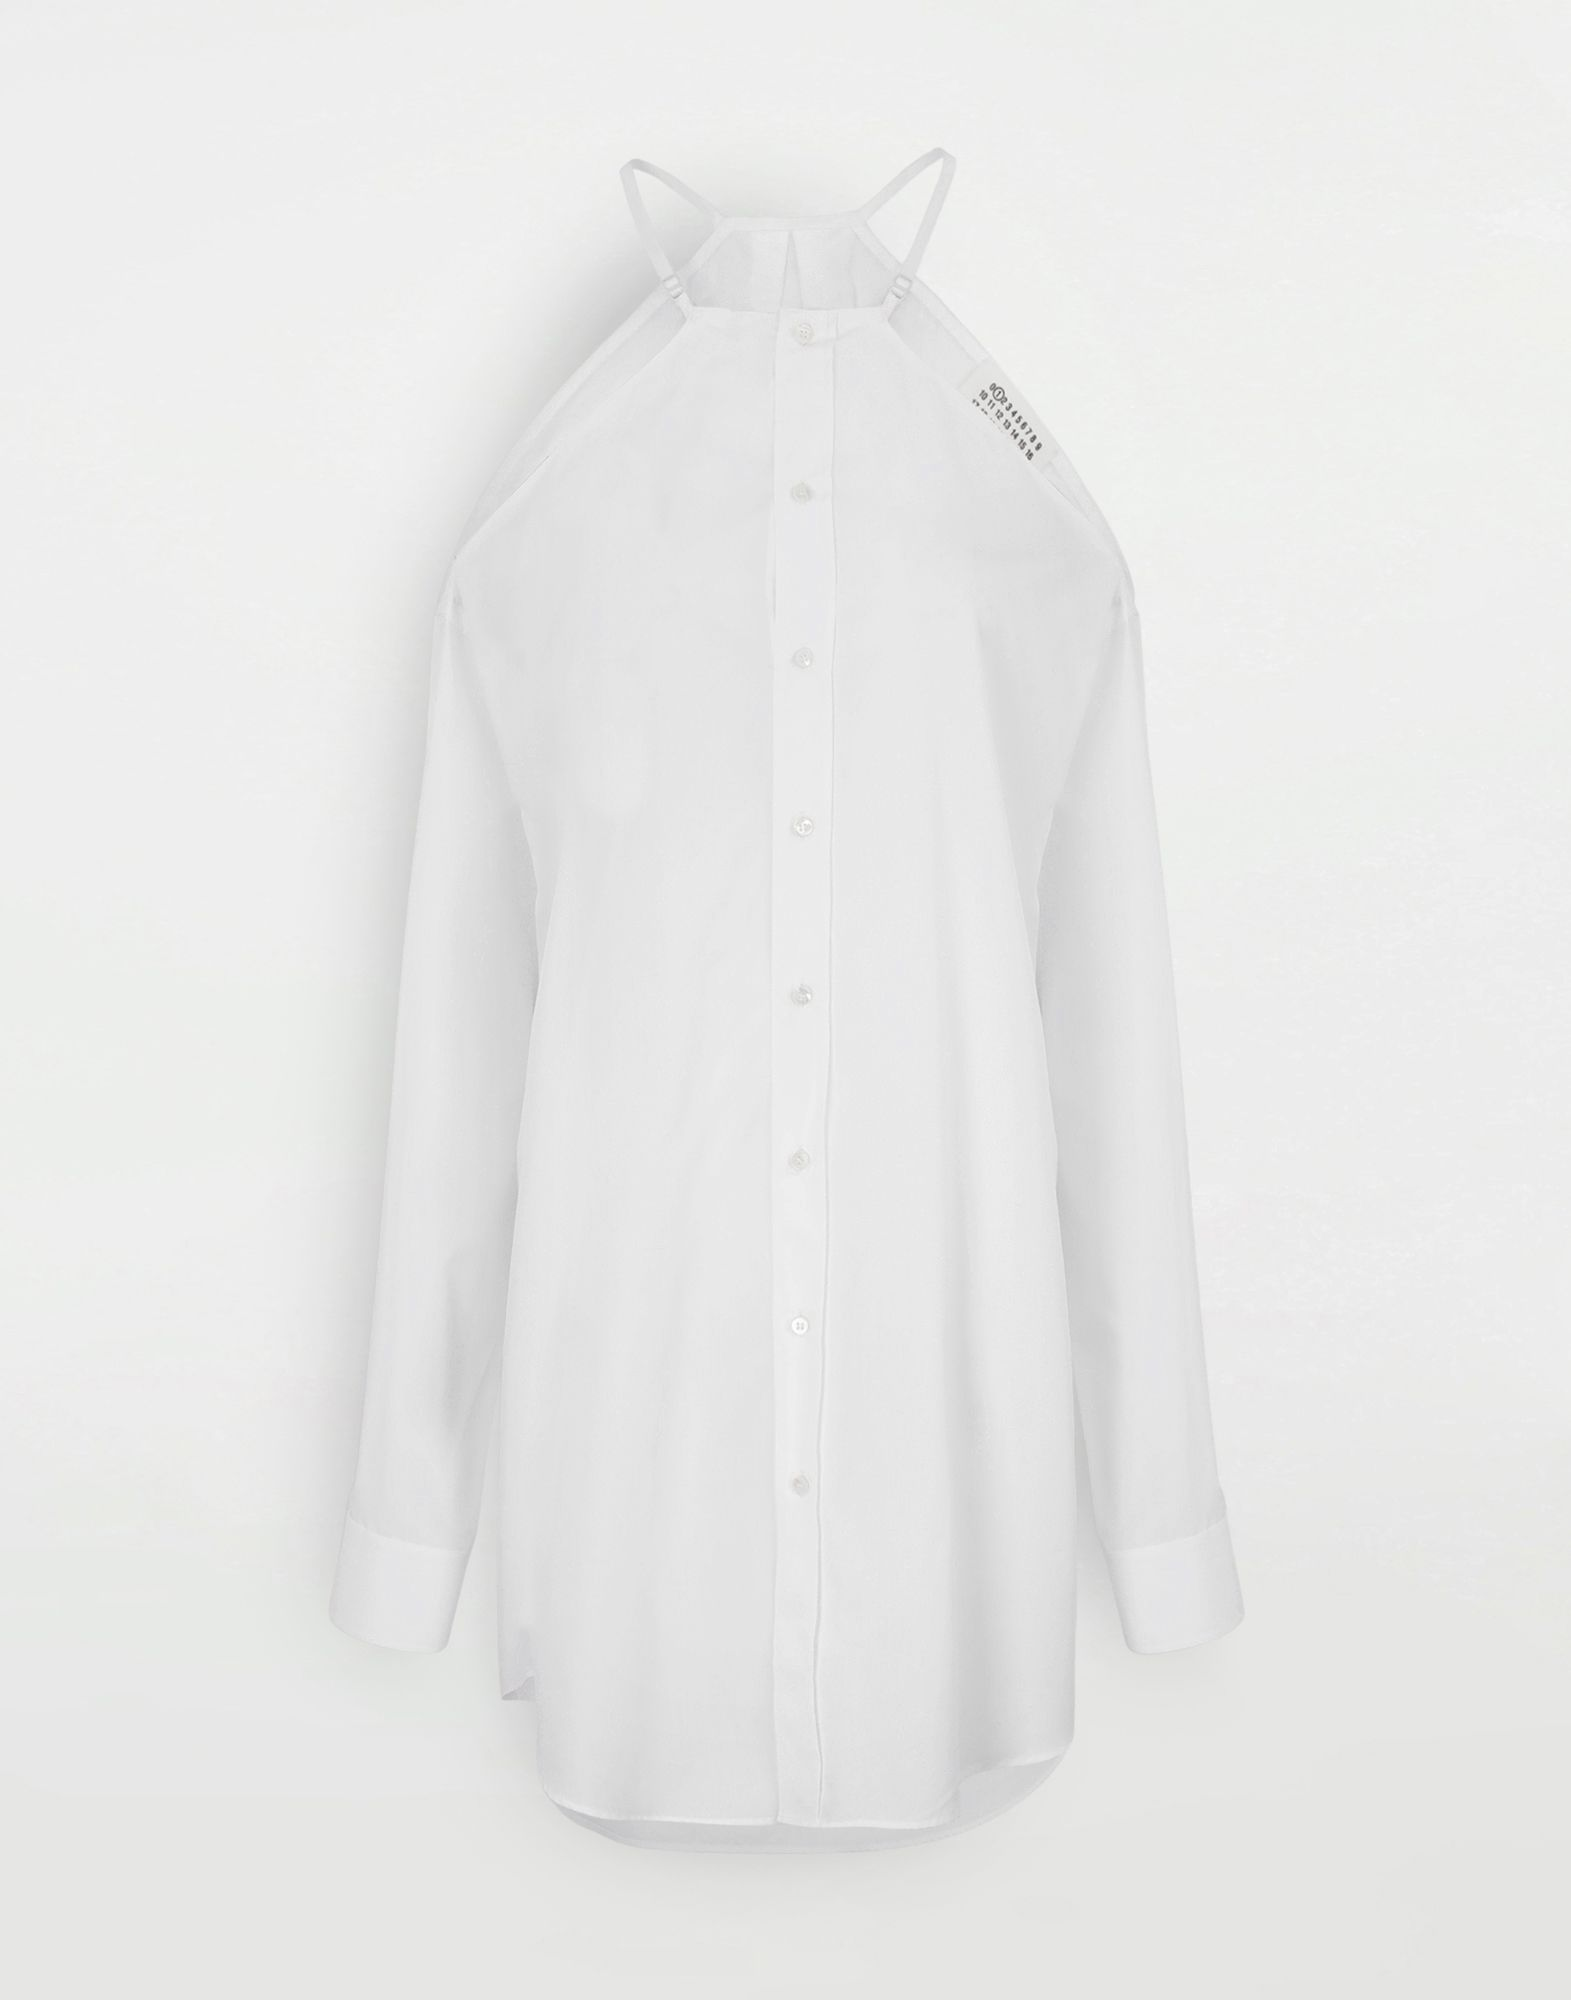 MAISON MARGIELA Multi-wear shirt Long sleeve shirt Woman f